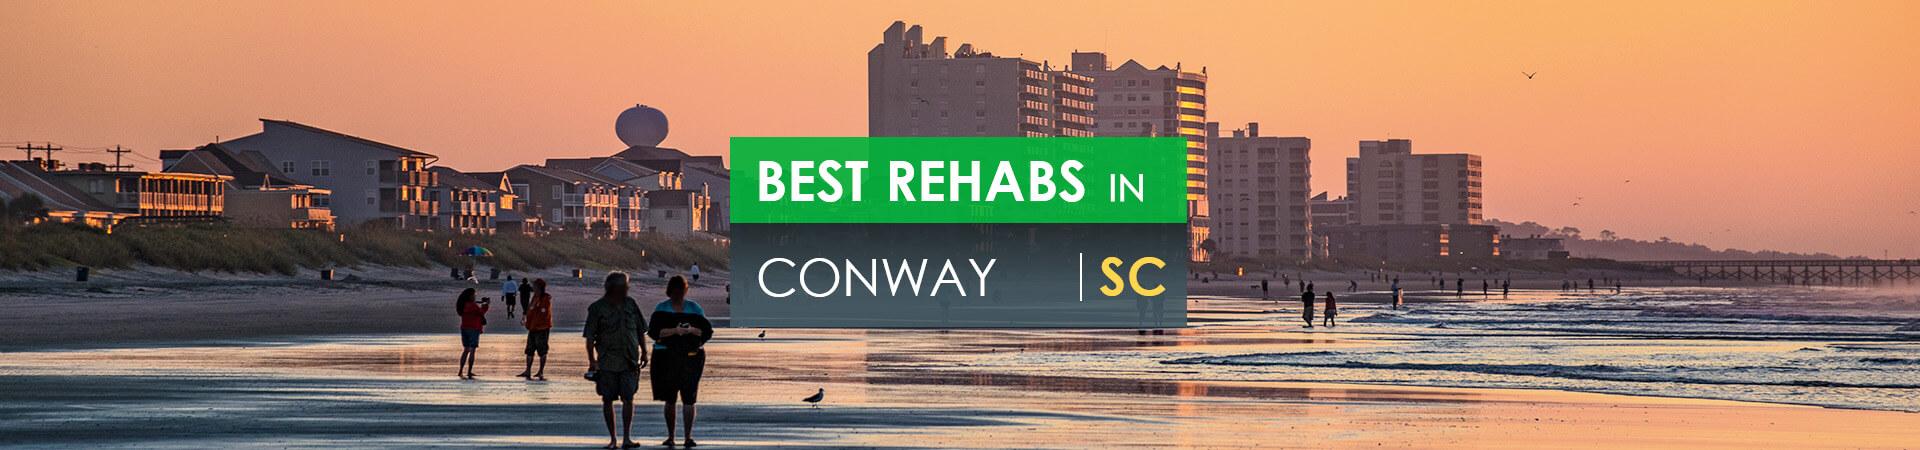 Best rehabs in Conway, SC